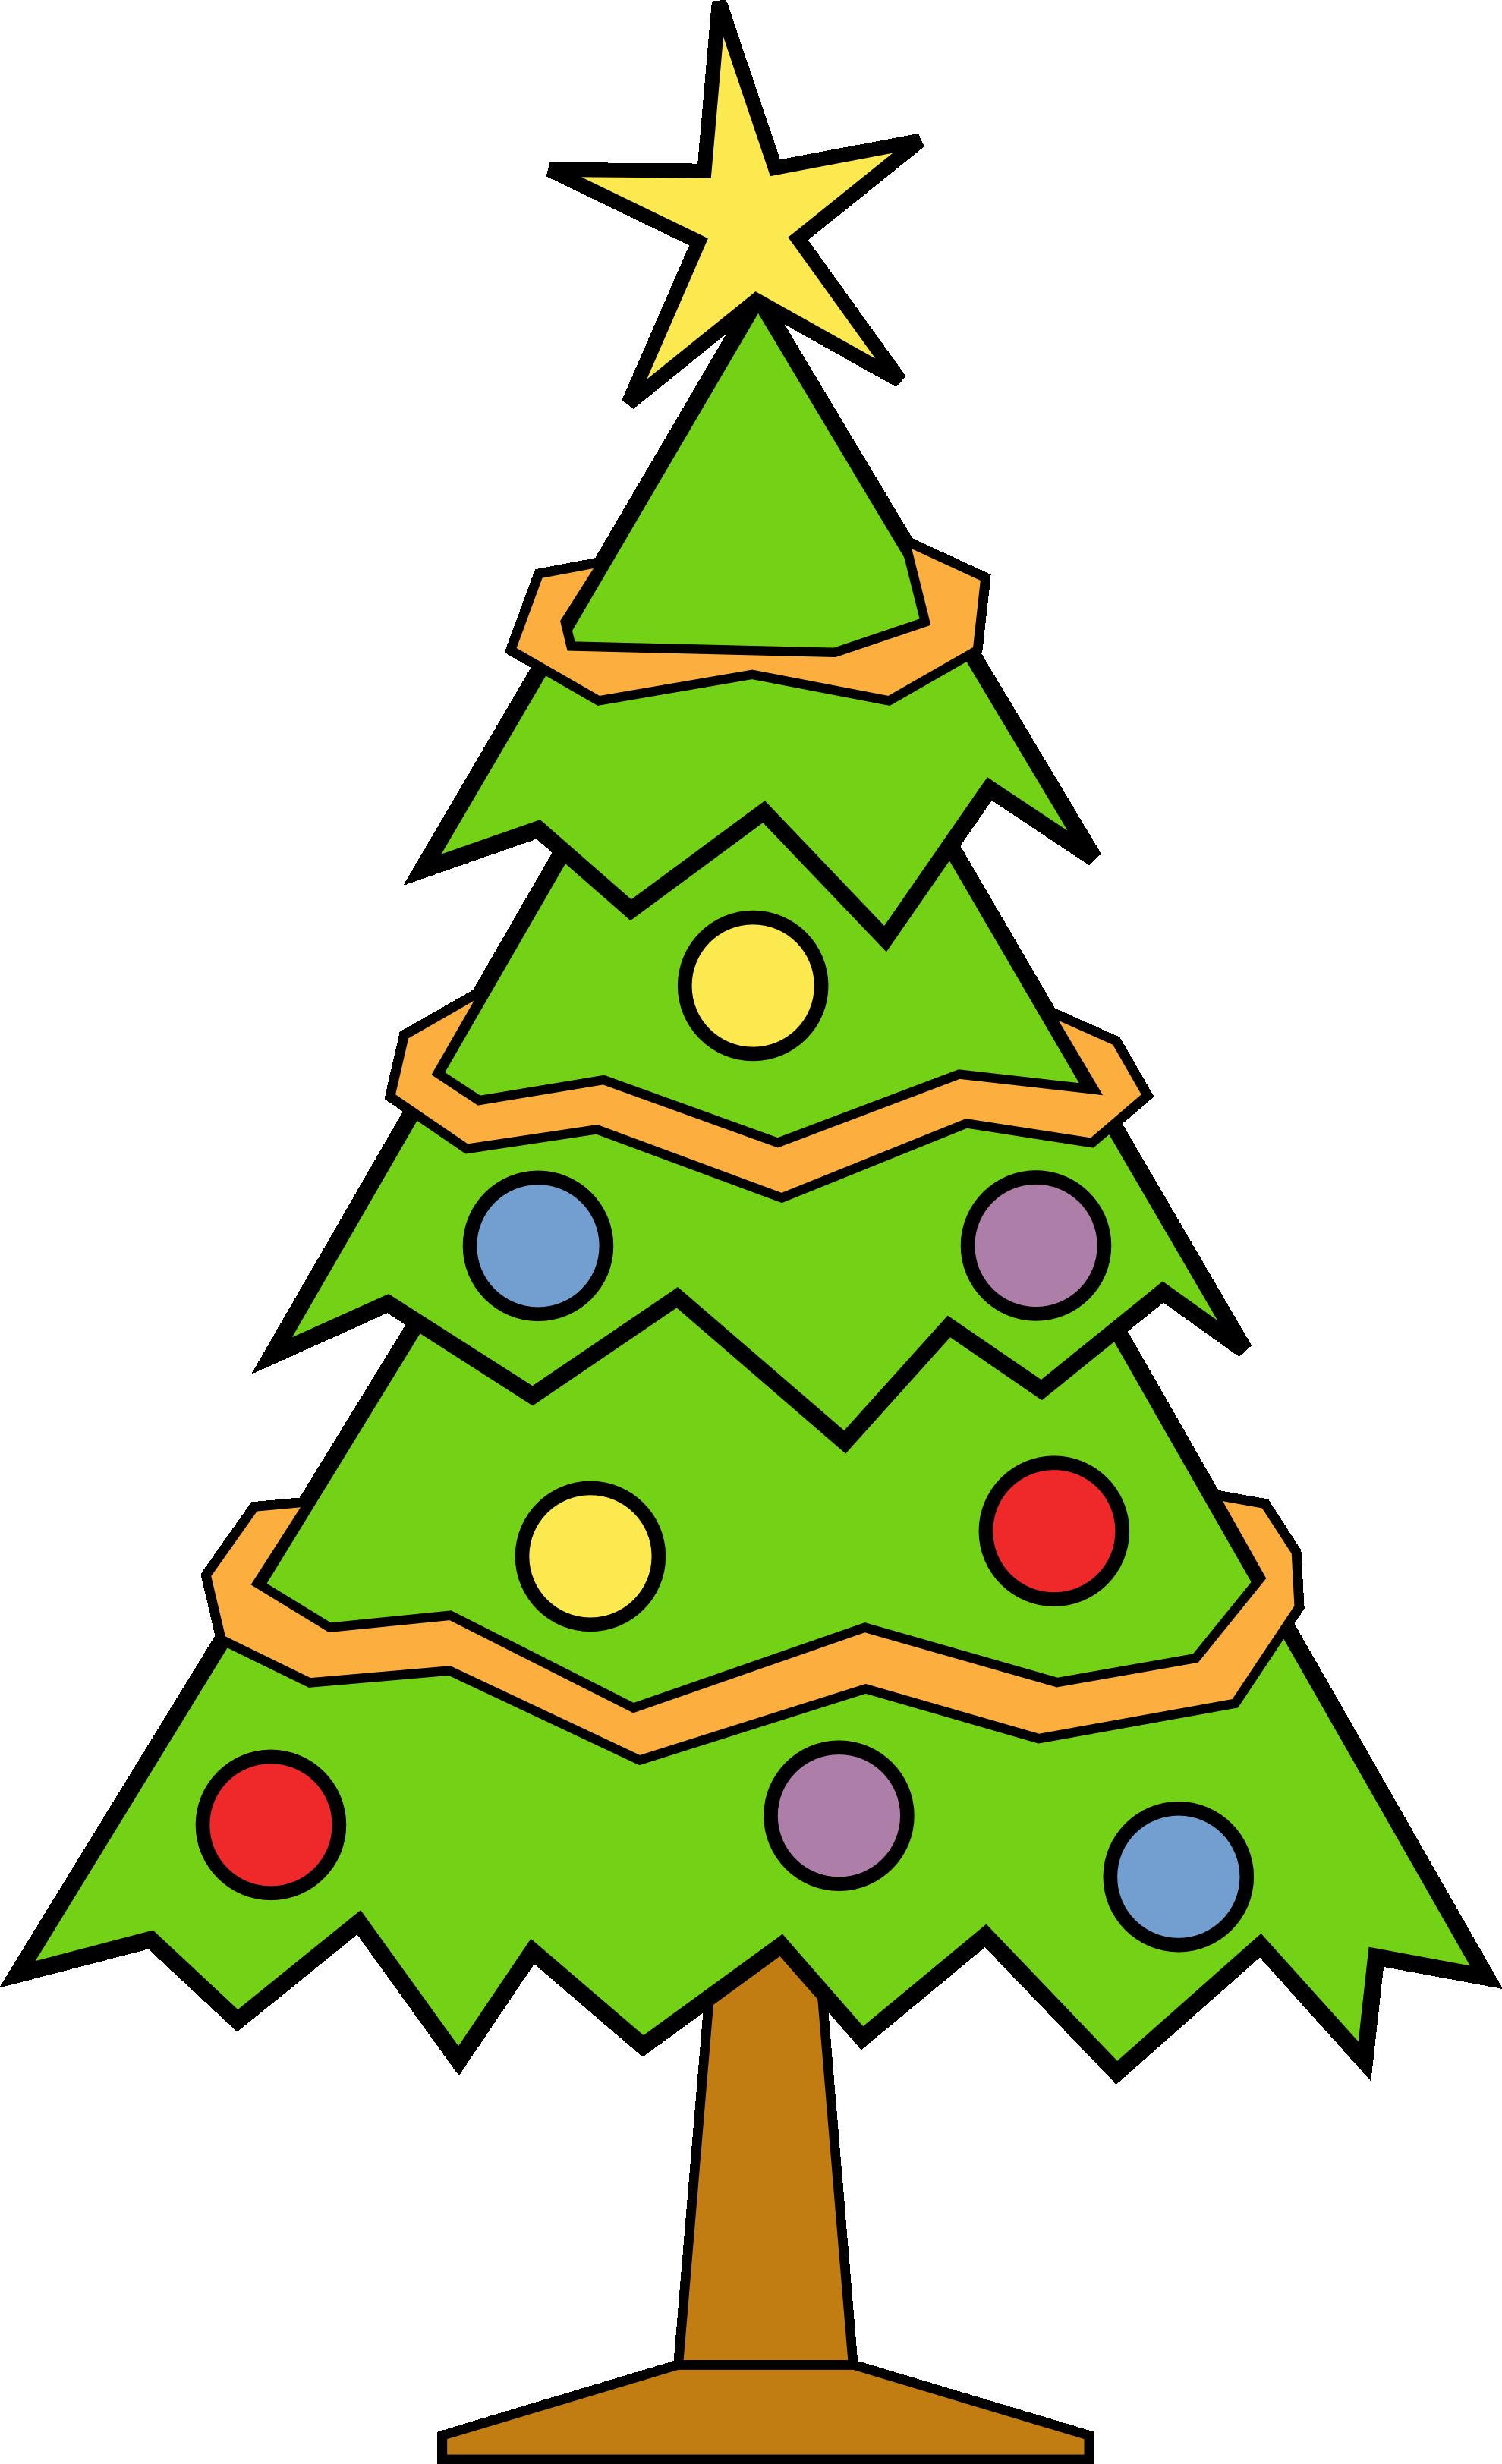 Xmas tree clip art christmas tree clipart black and white.